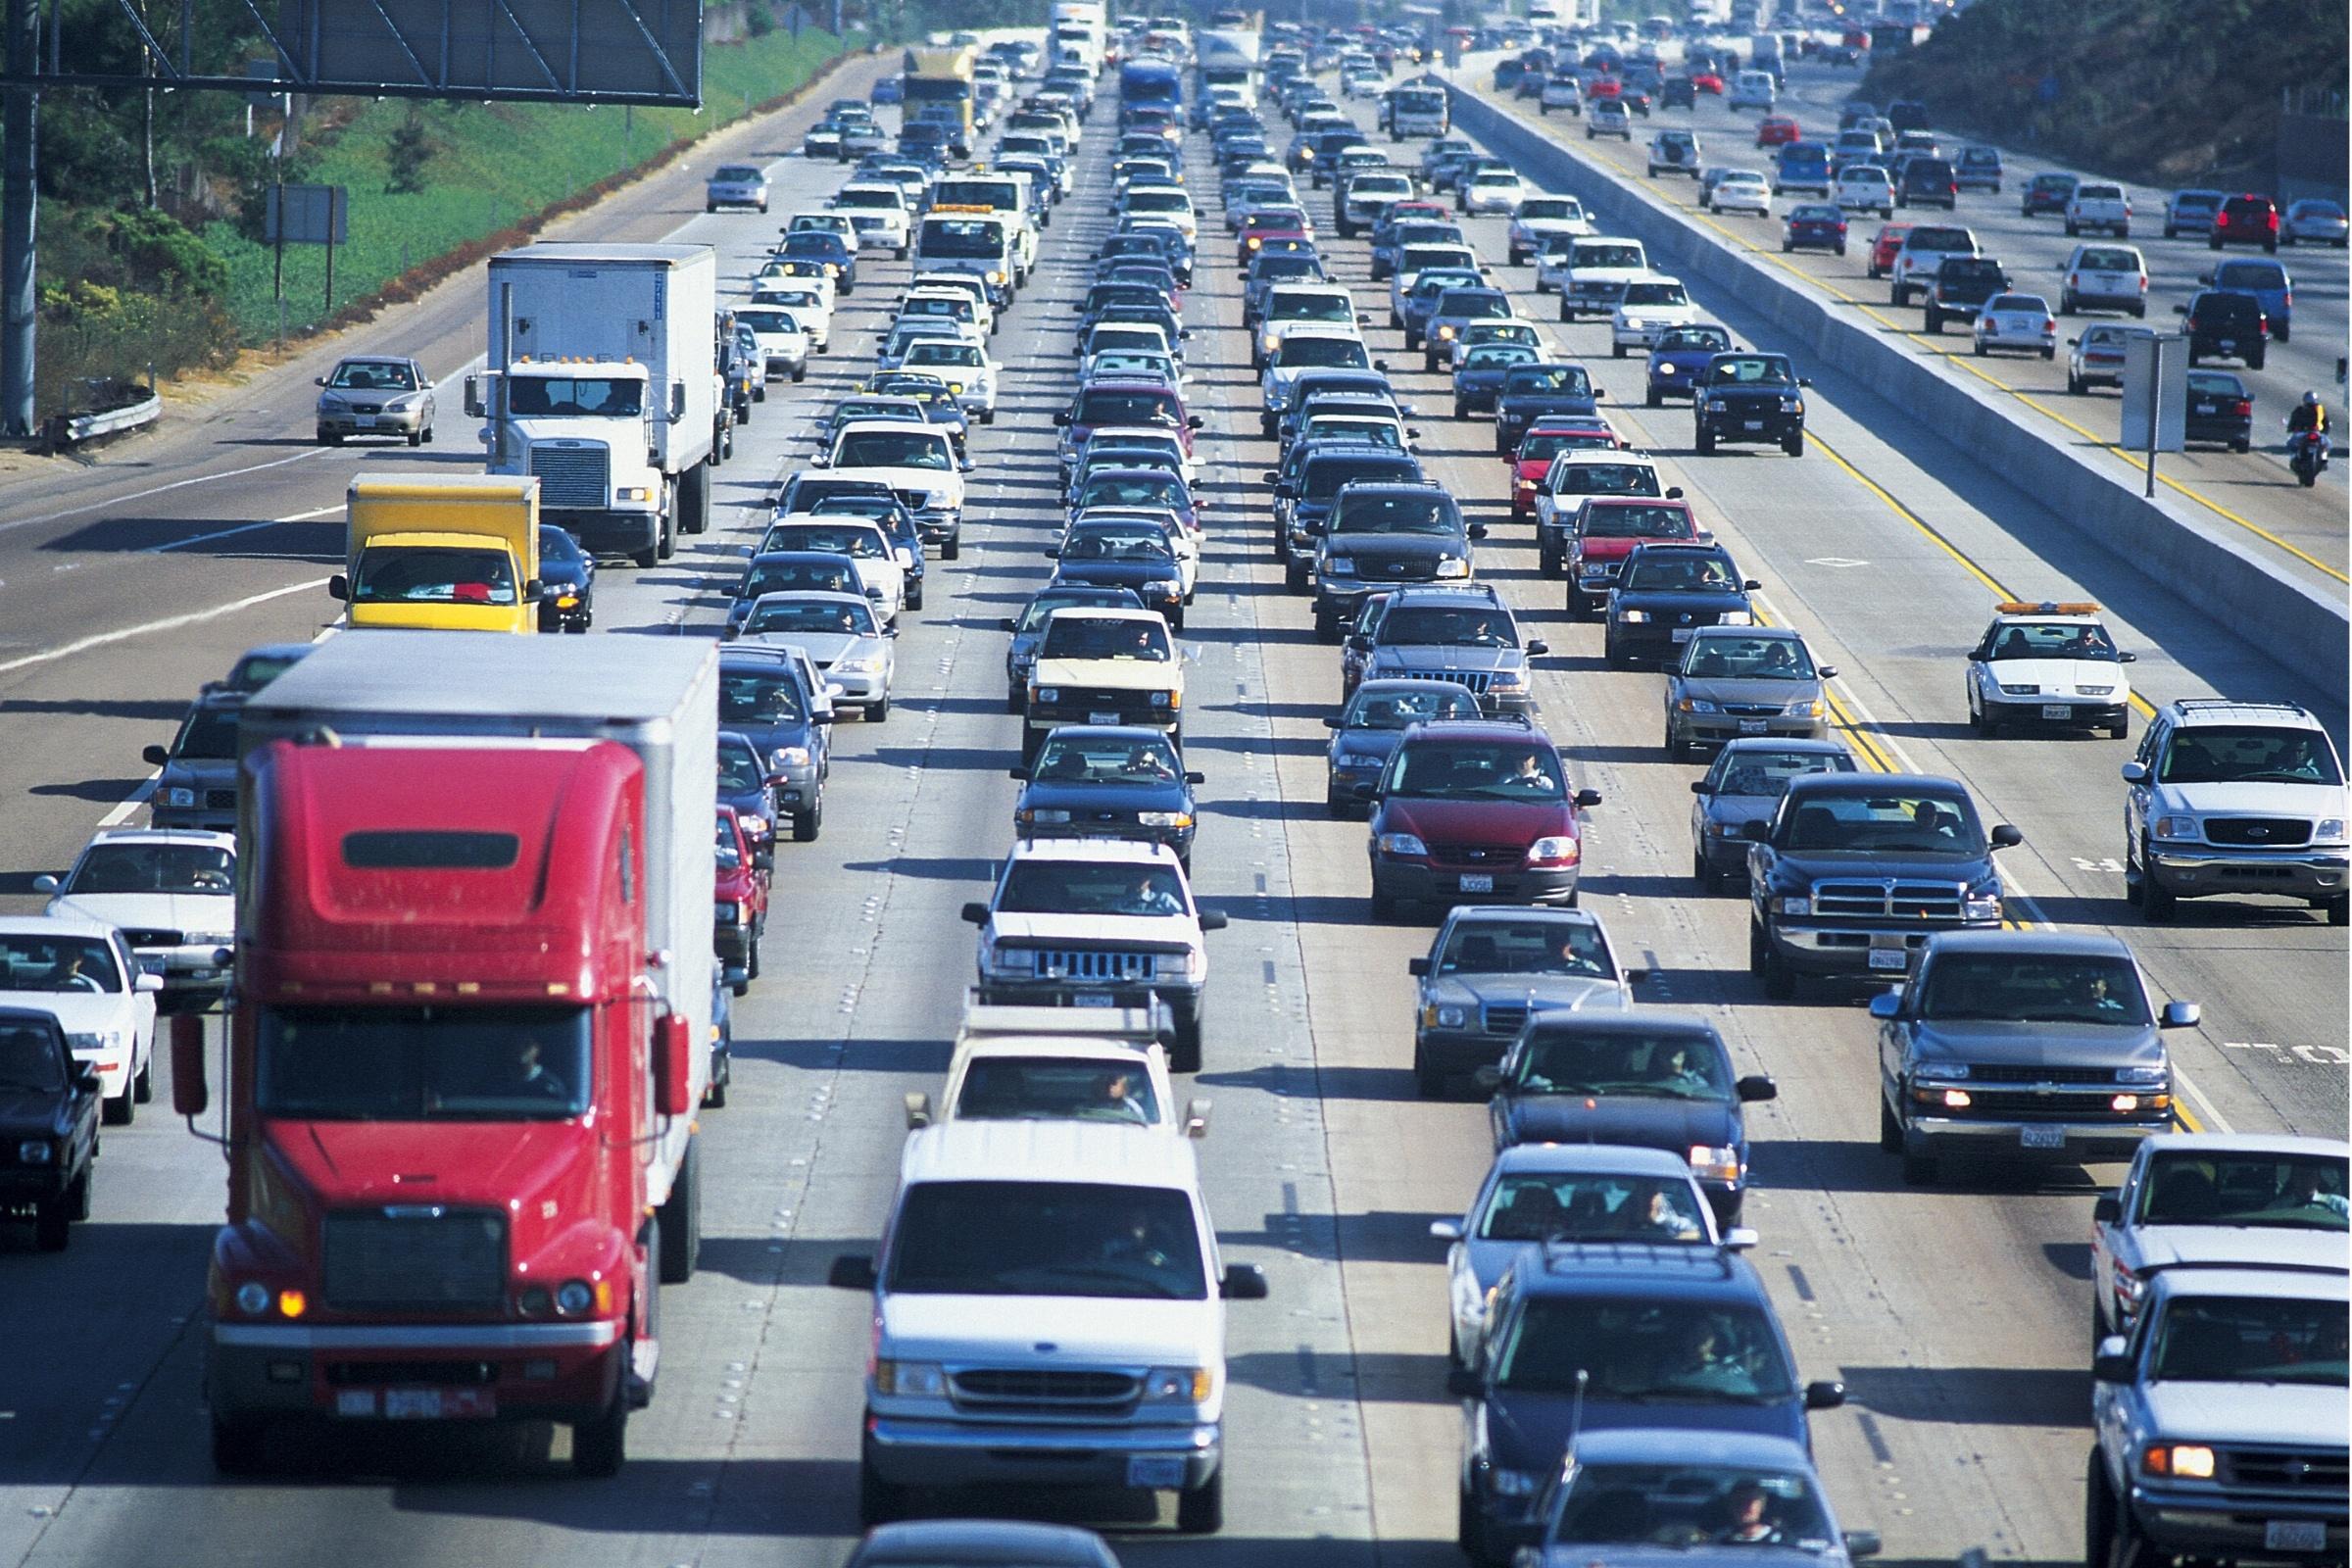 Location Limtation Traffic Jam-Day